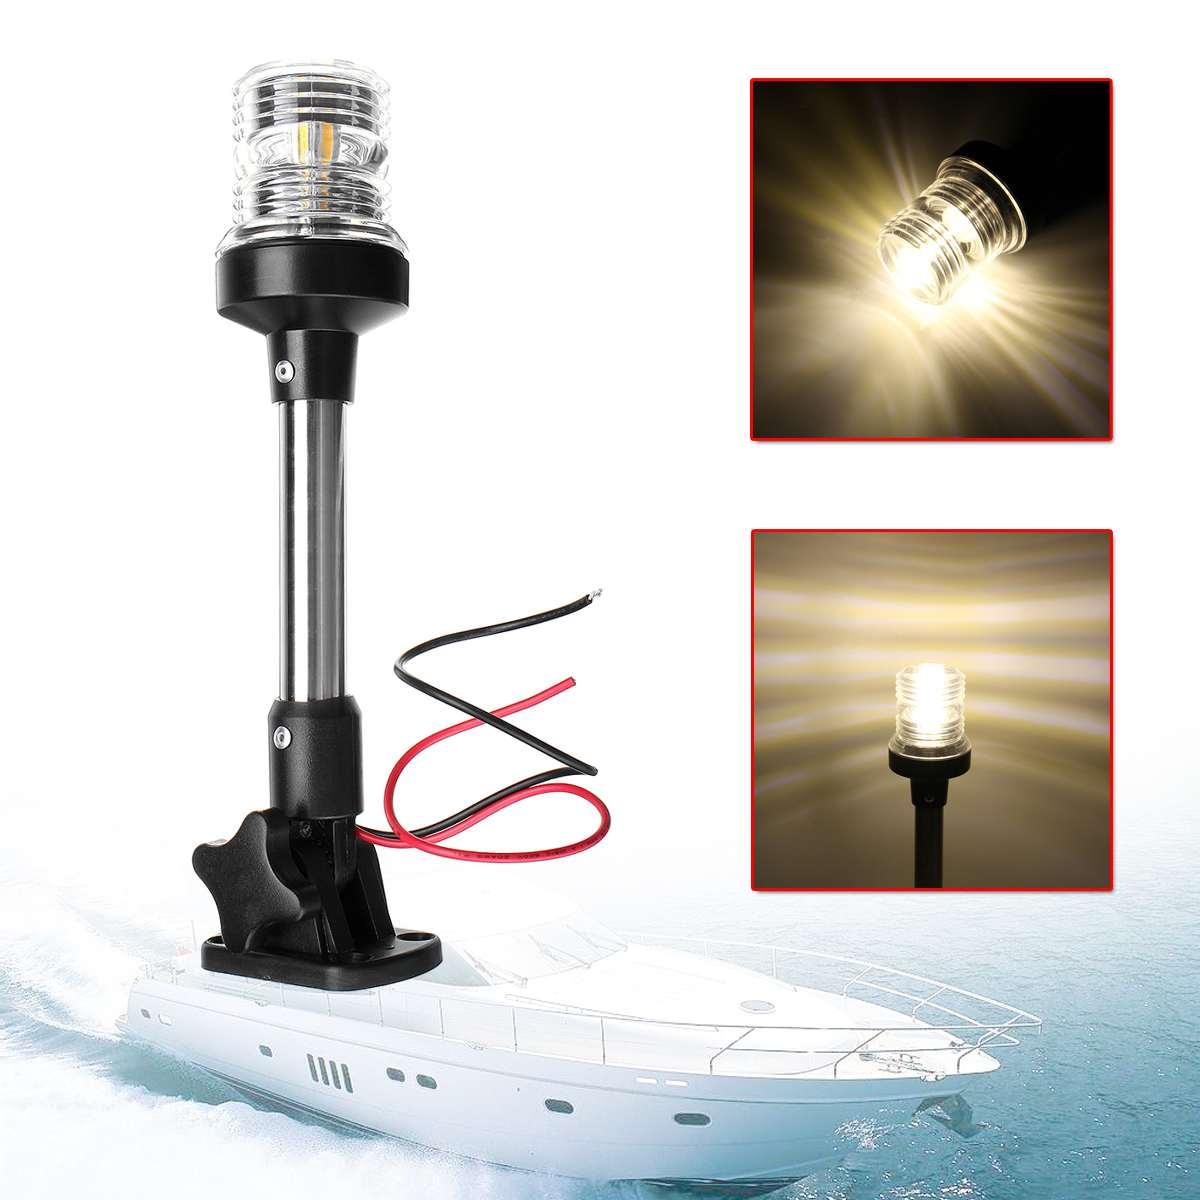 25 L All Round Navigation Light 12 VDC 8W Pactrade Marine Boat Adjustable S.S